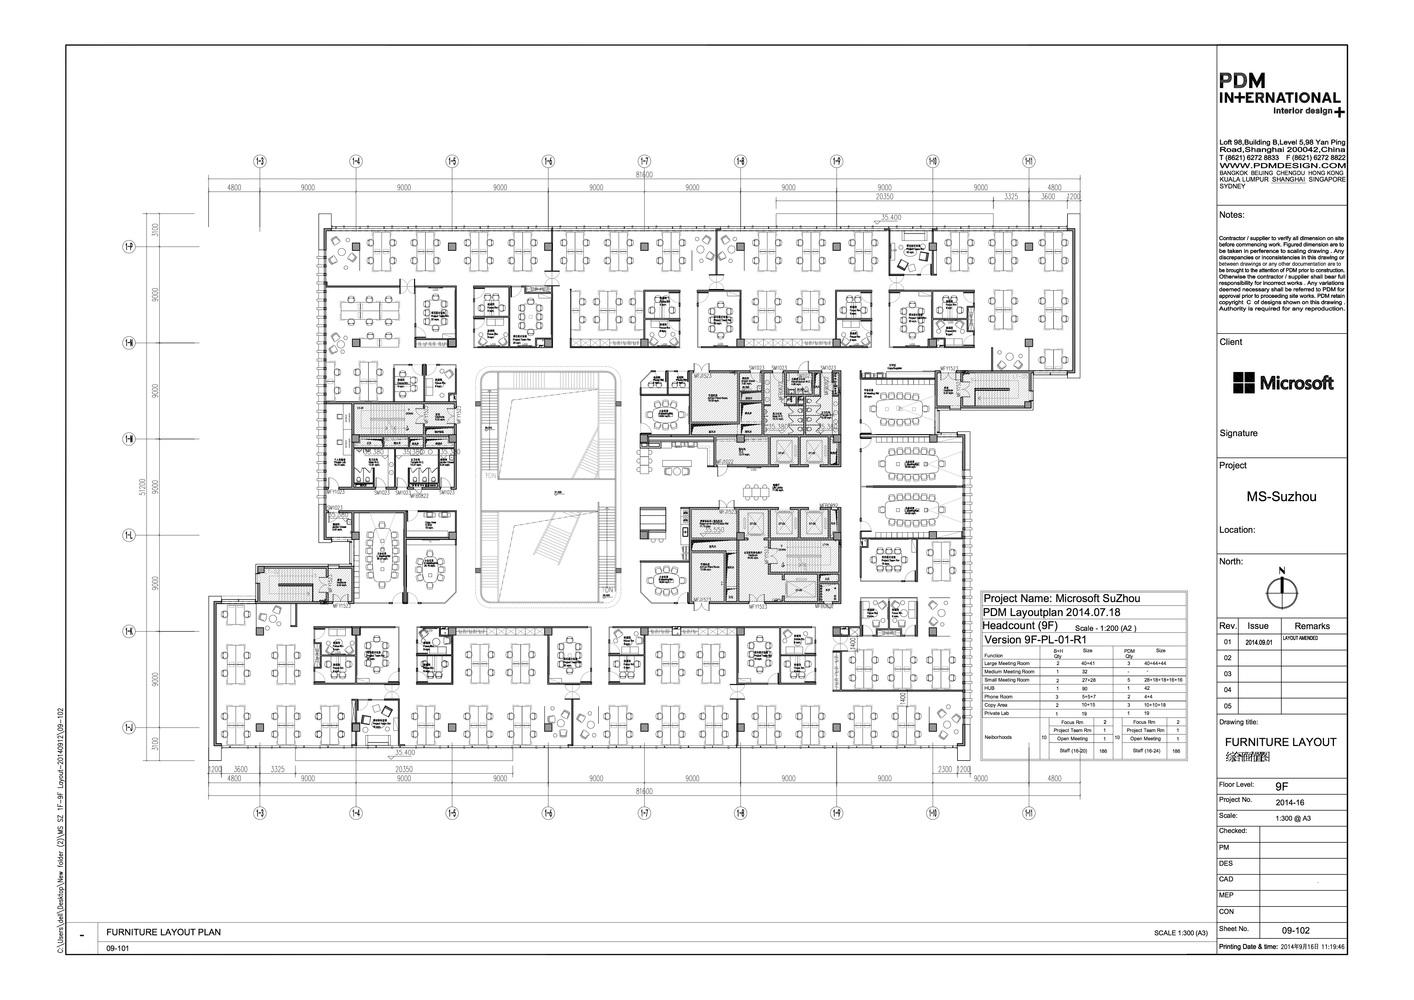 microsoft suzhou technology center pdm international [ 1414 x 1000 Pixel ]